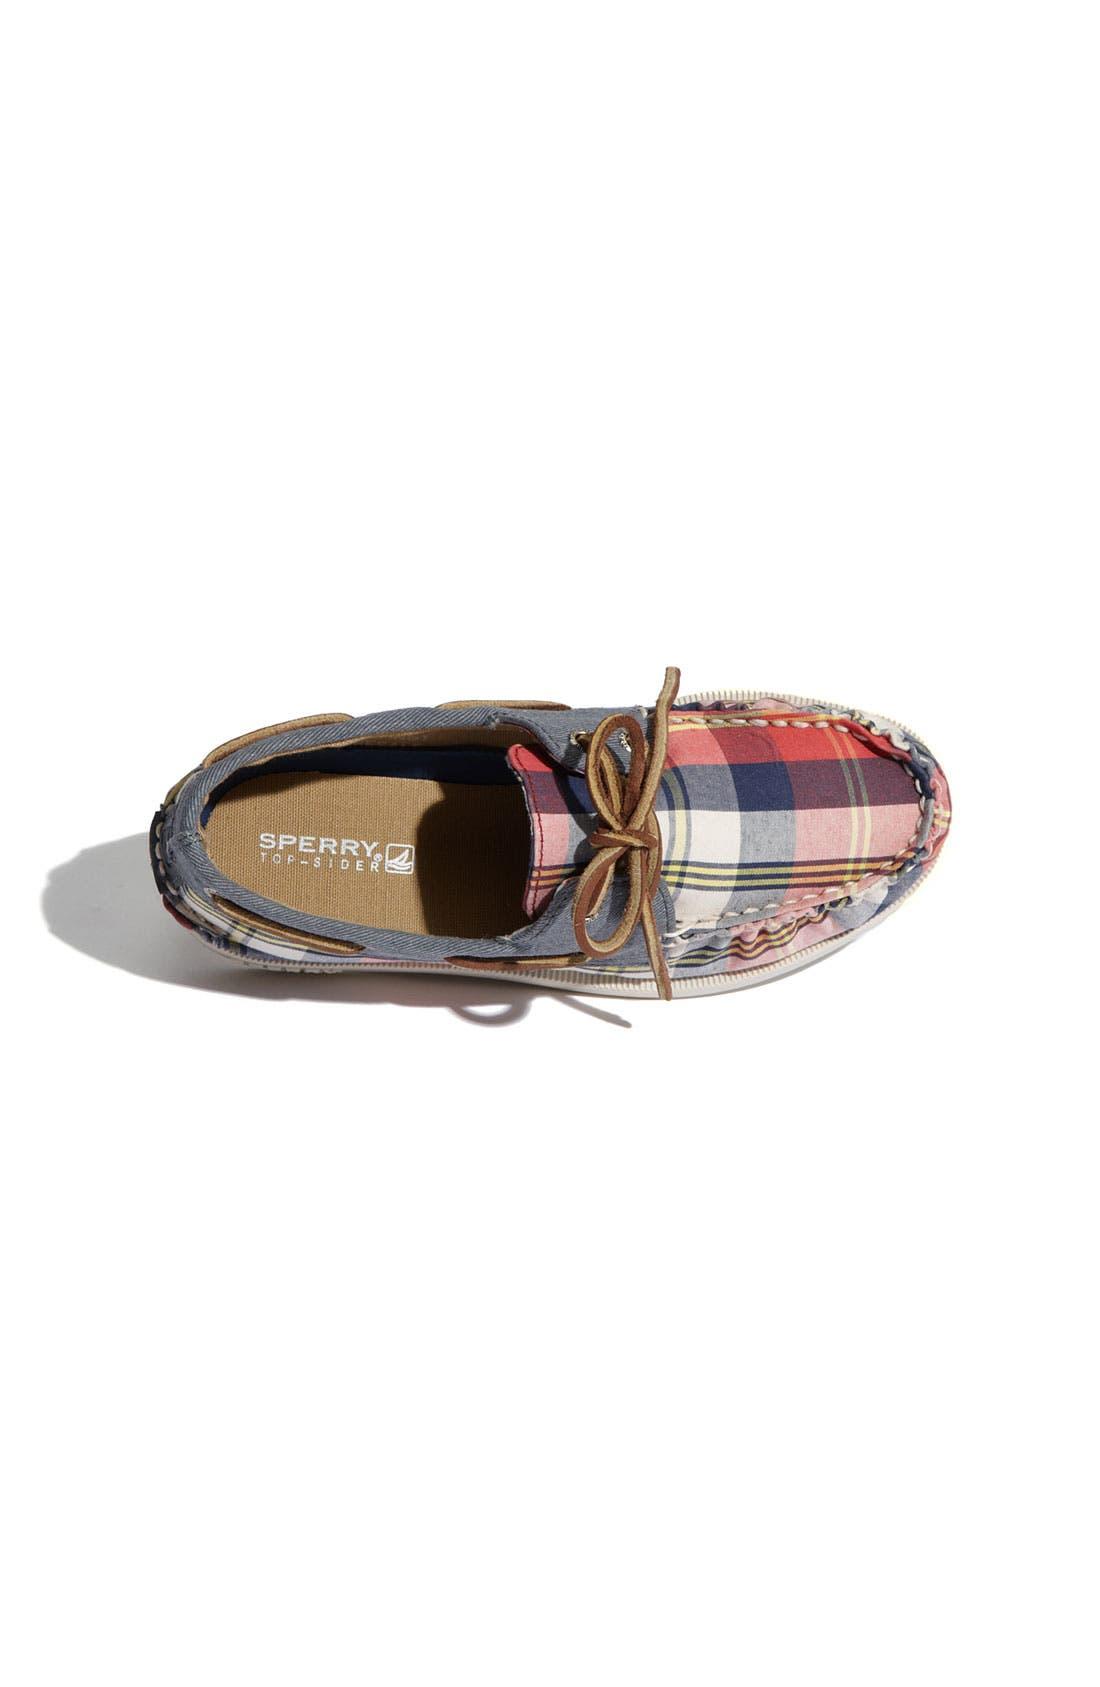 Alternate Image 3  - Sperry Top-Sider® 'Authentic Original Plaid' Boat Shoe (Walker & Toddler)